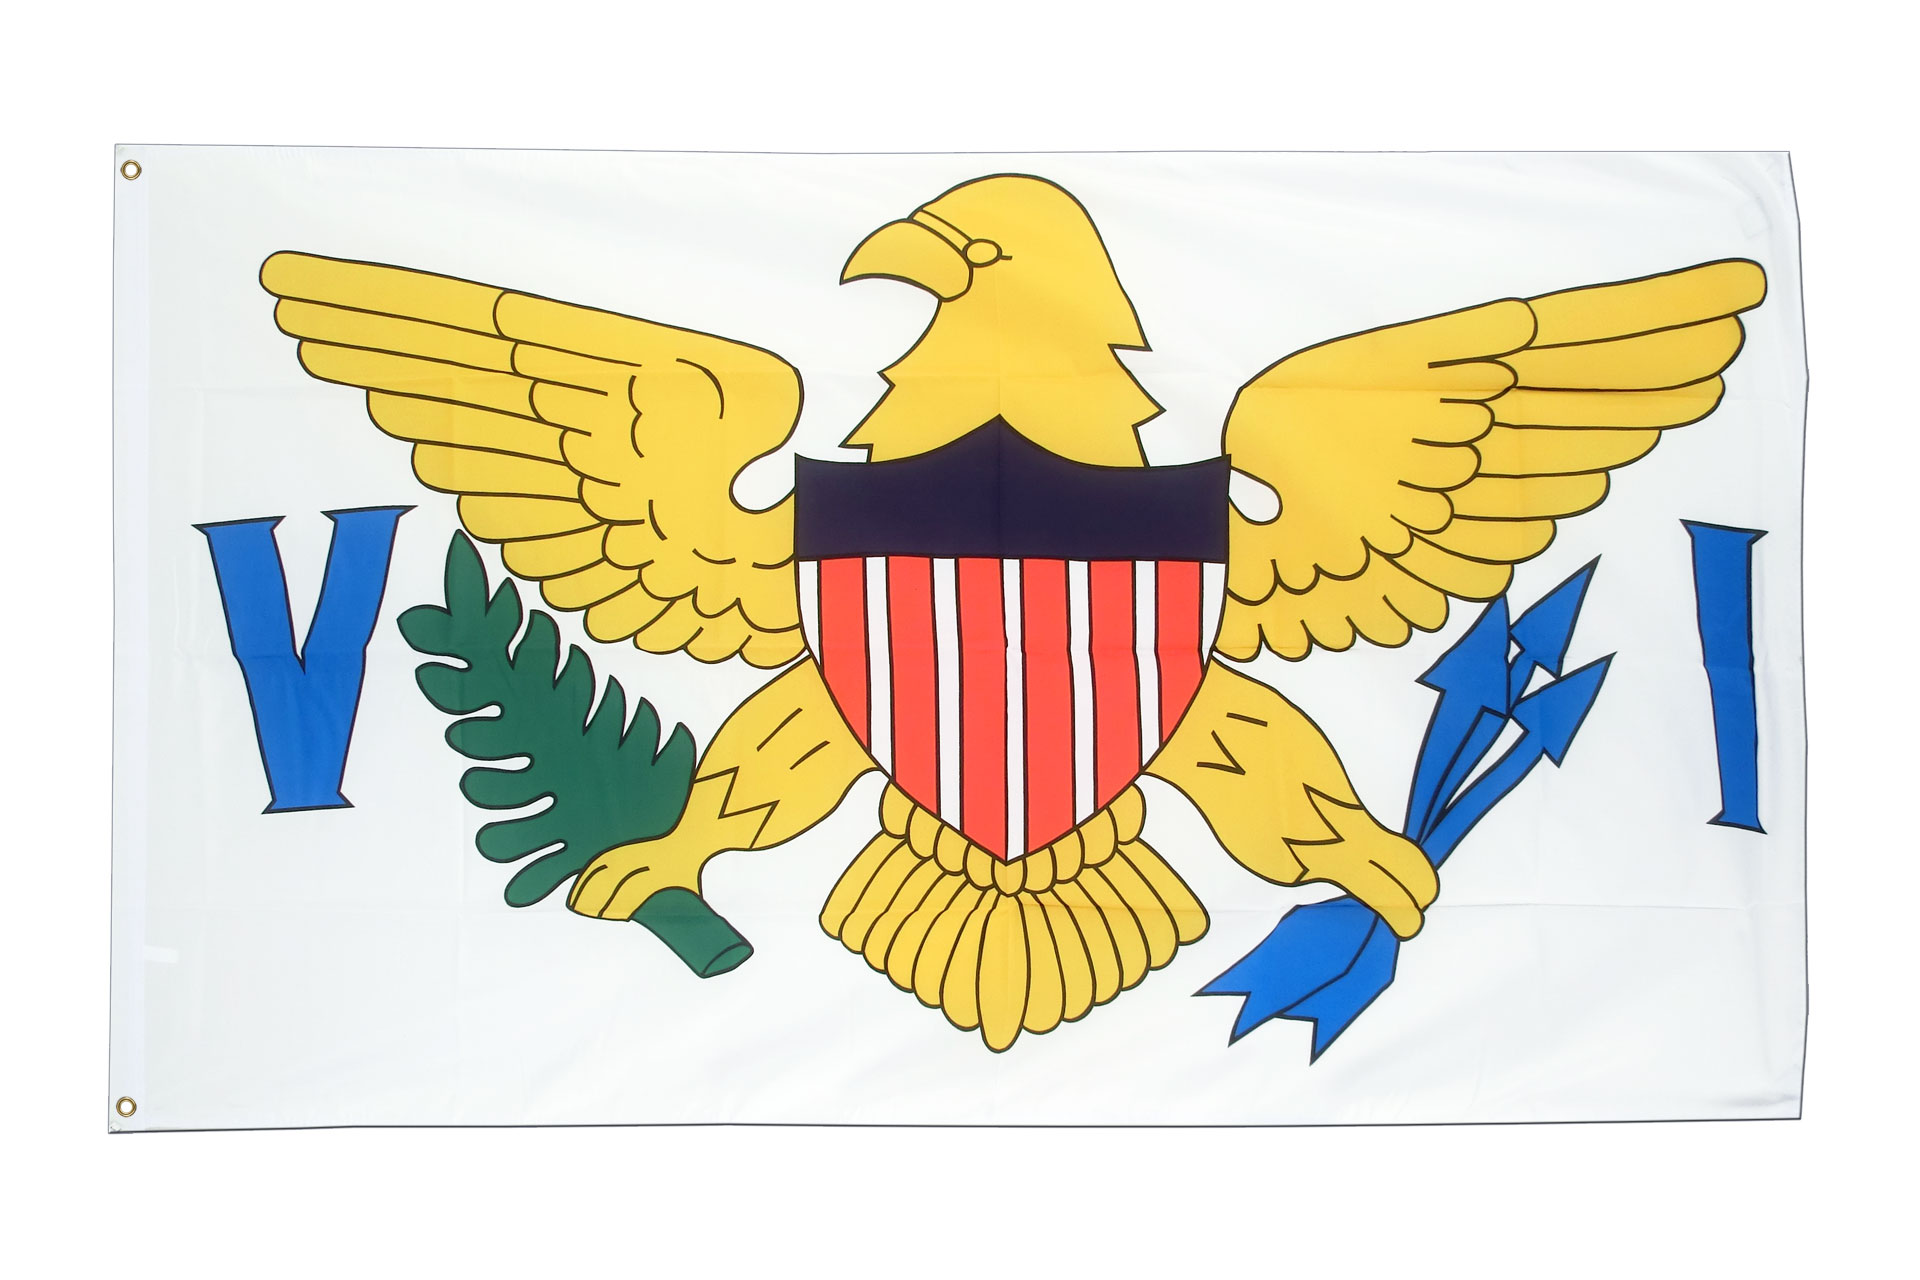 Buy Virgin Islands Flag - 3x5 ft (90x150 cm) - Royal-Flags: royal-flags.co.uk/virgin-islands-flag-2100.html